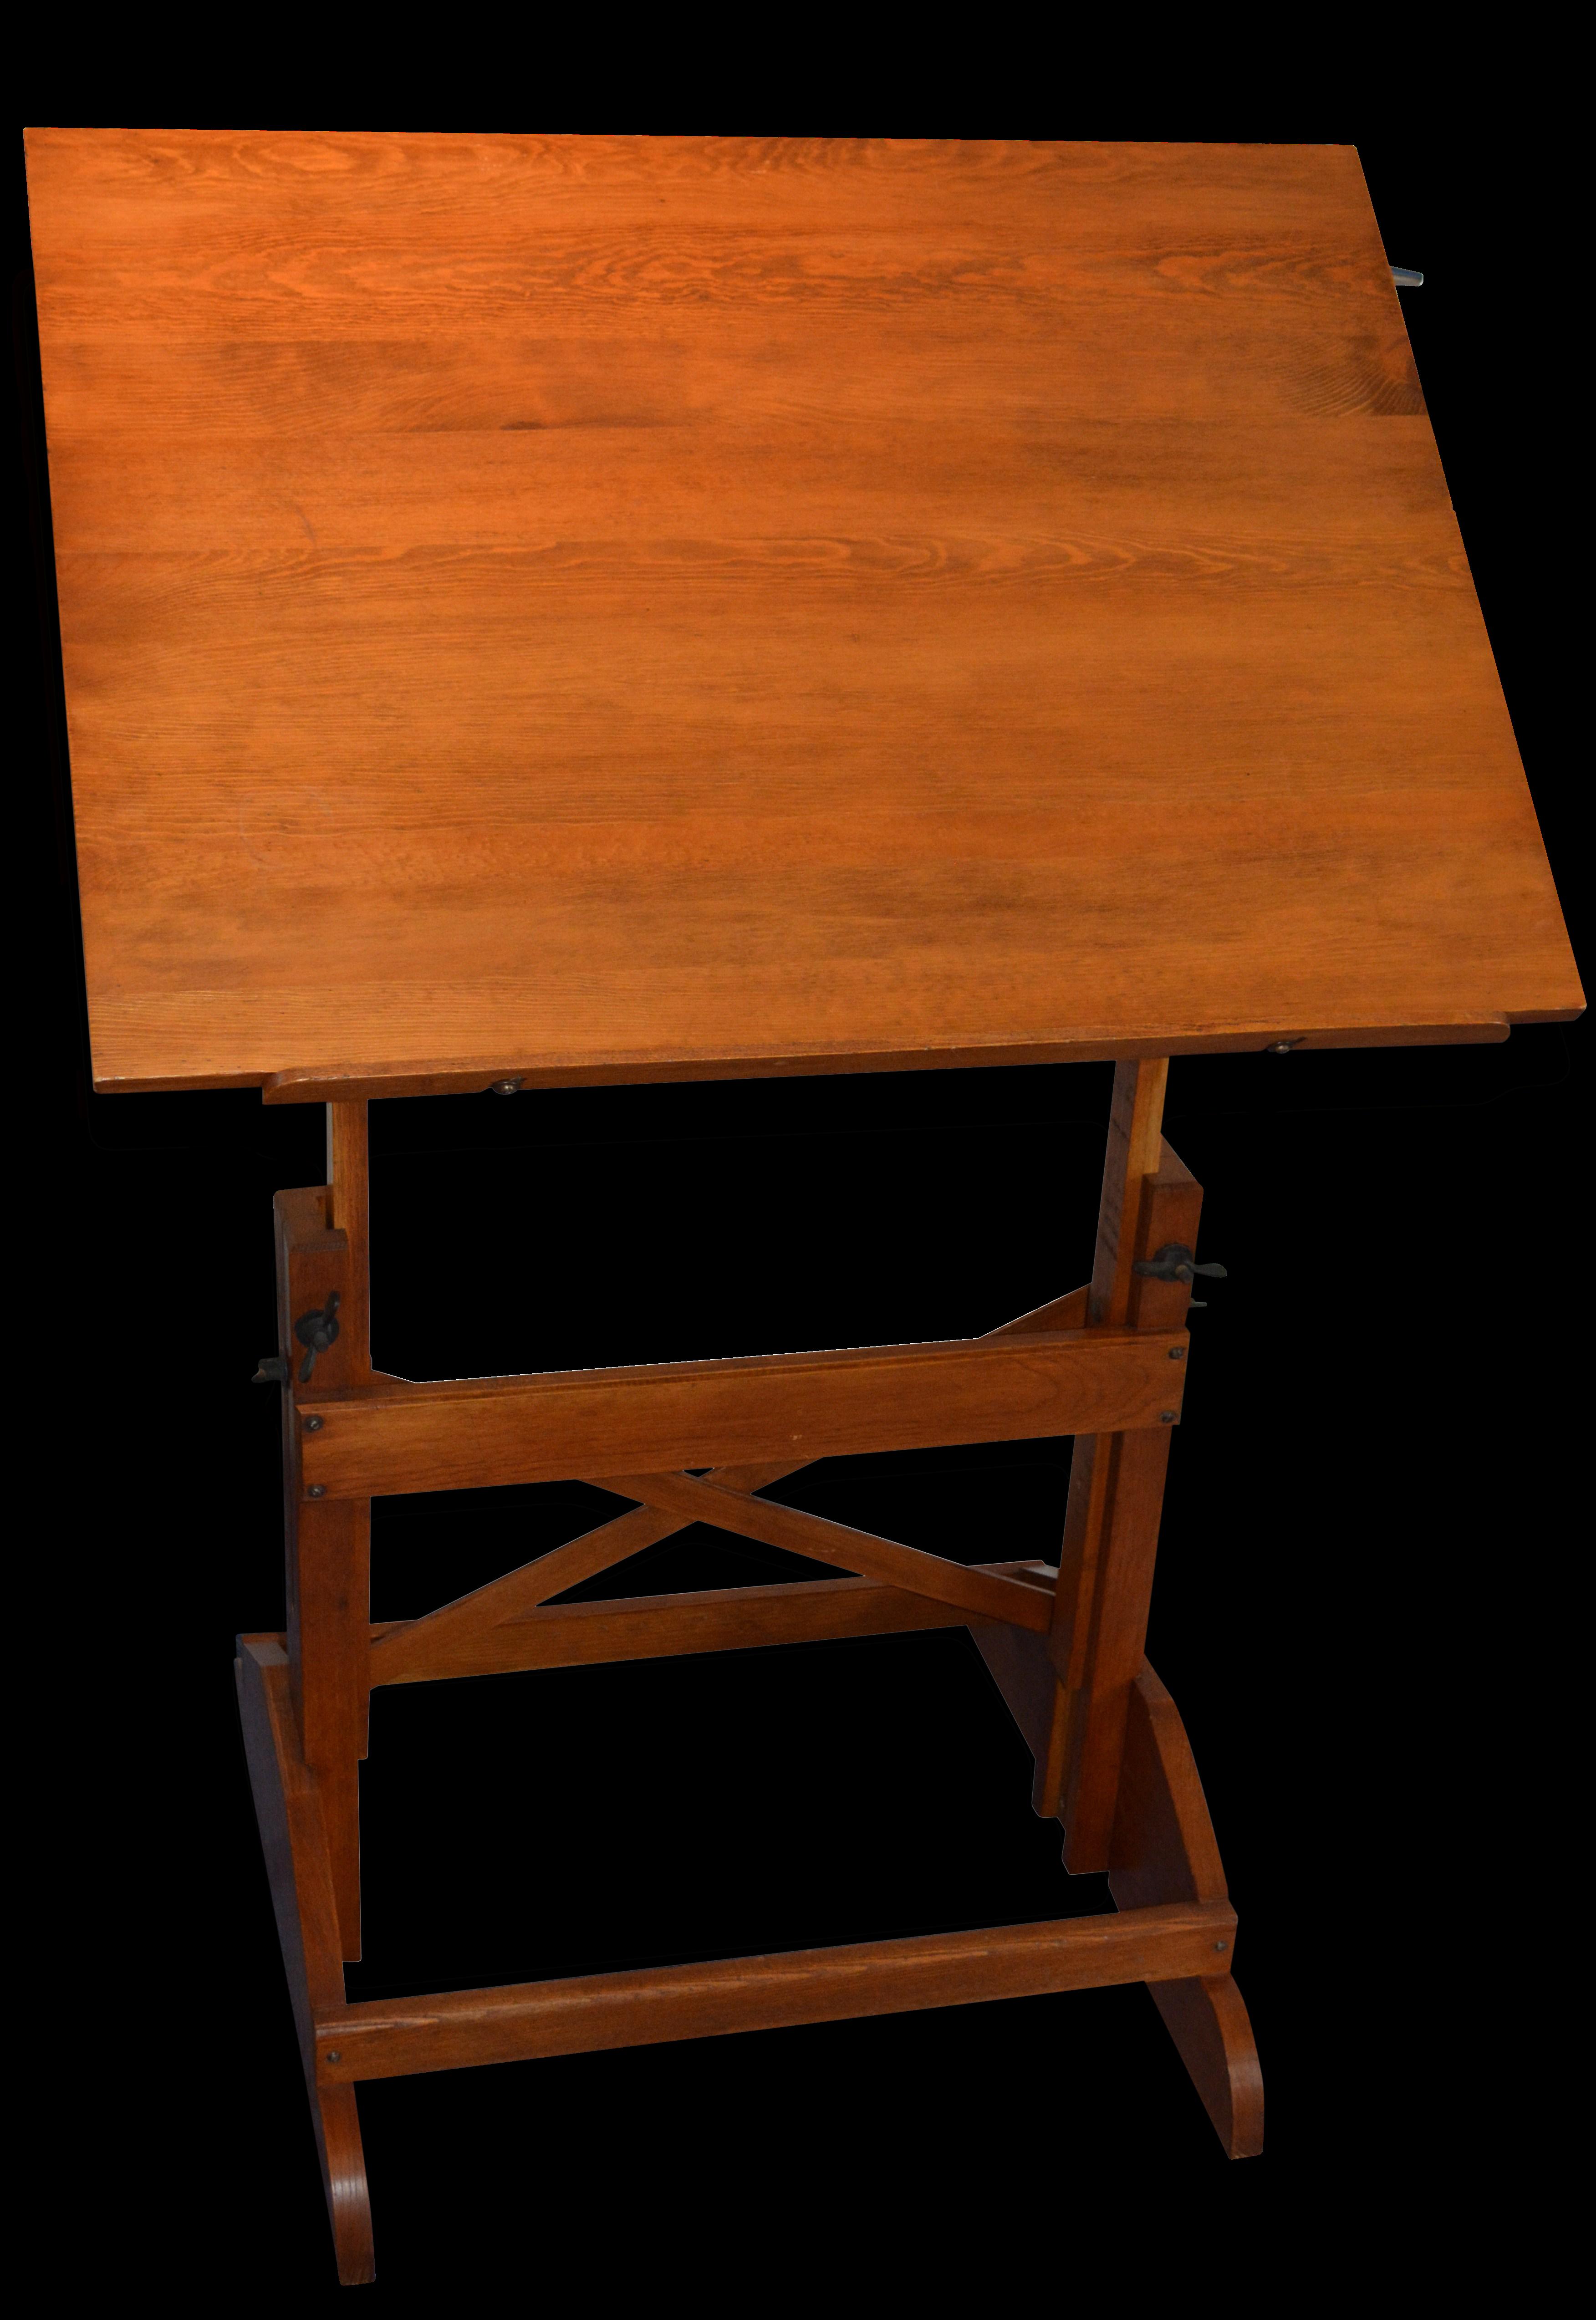 table dessin inclinable bureau dessin en rable ibo. Black Bedroom Furniture Sets. Home Design Ideas